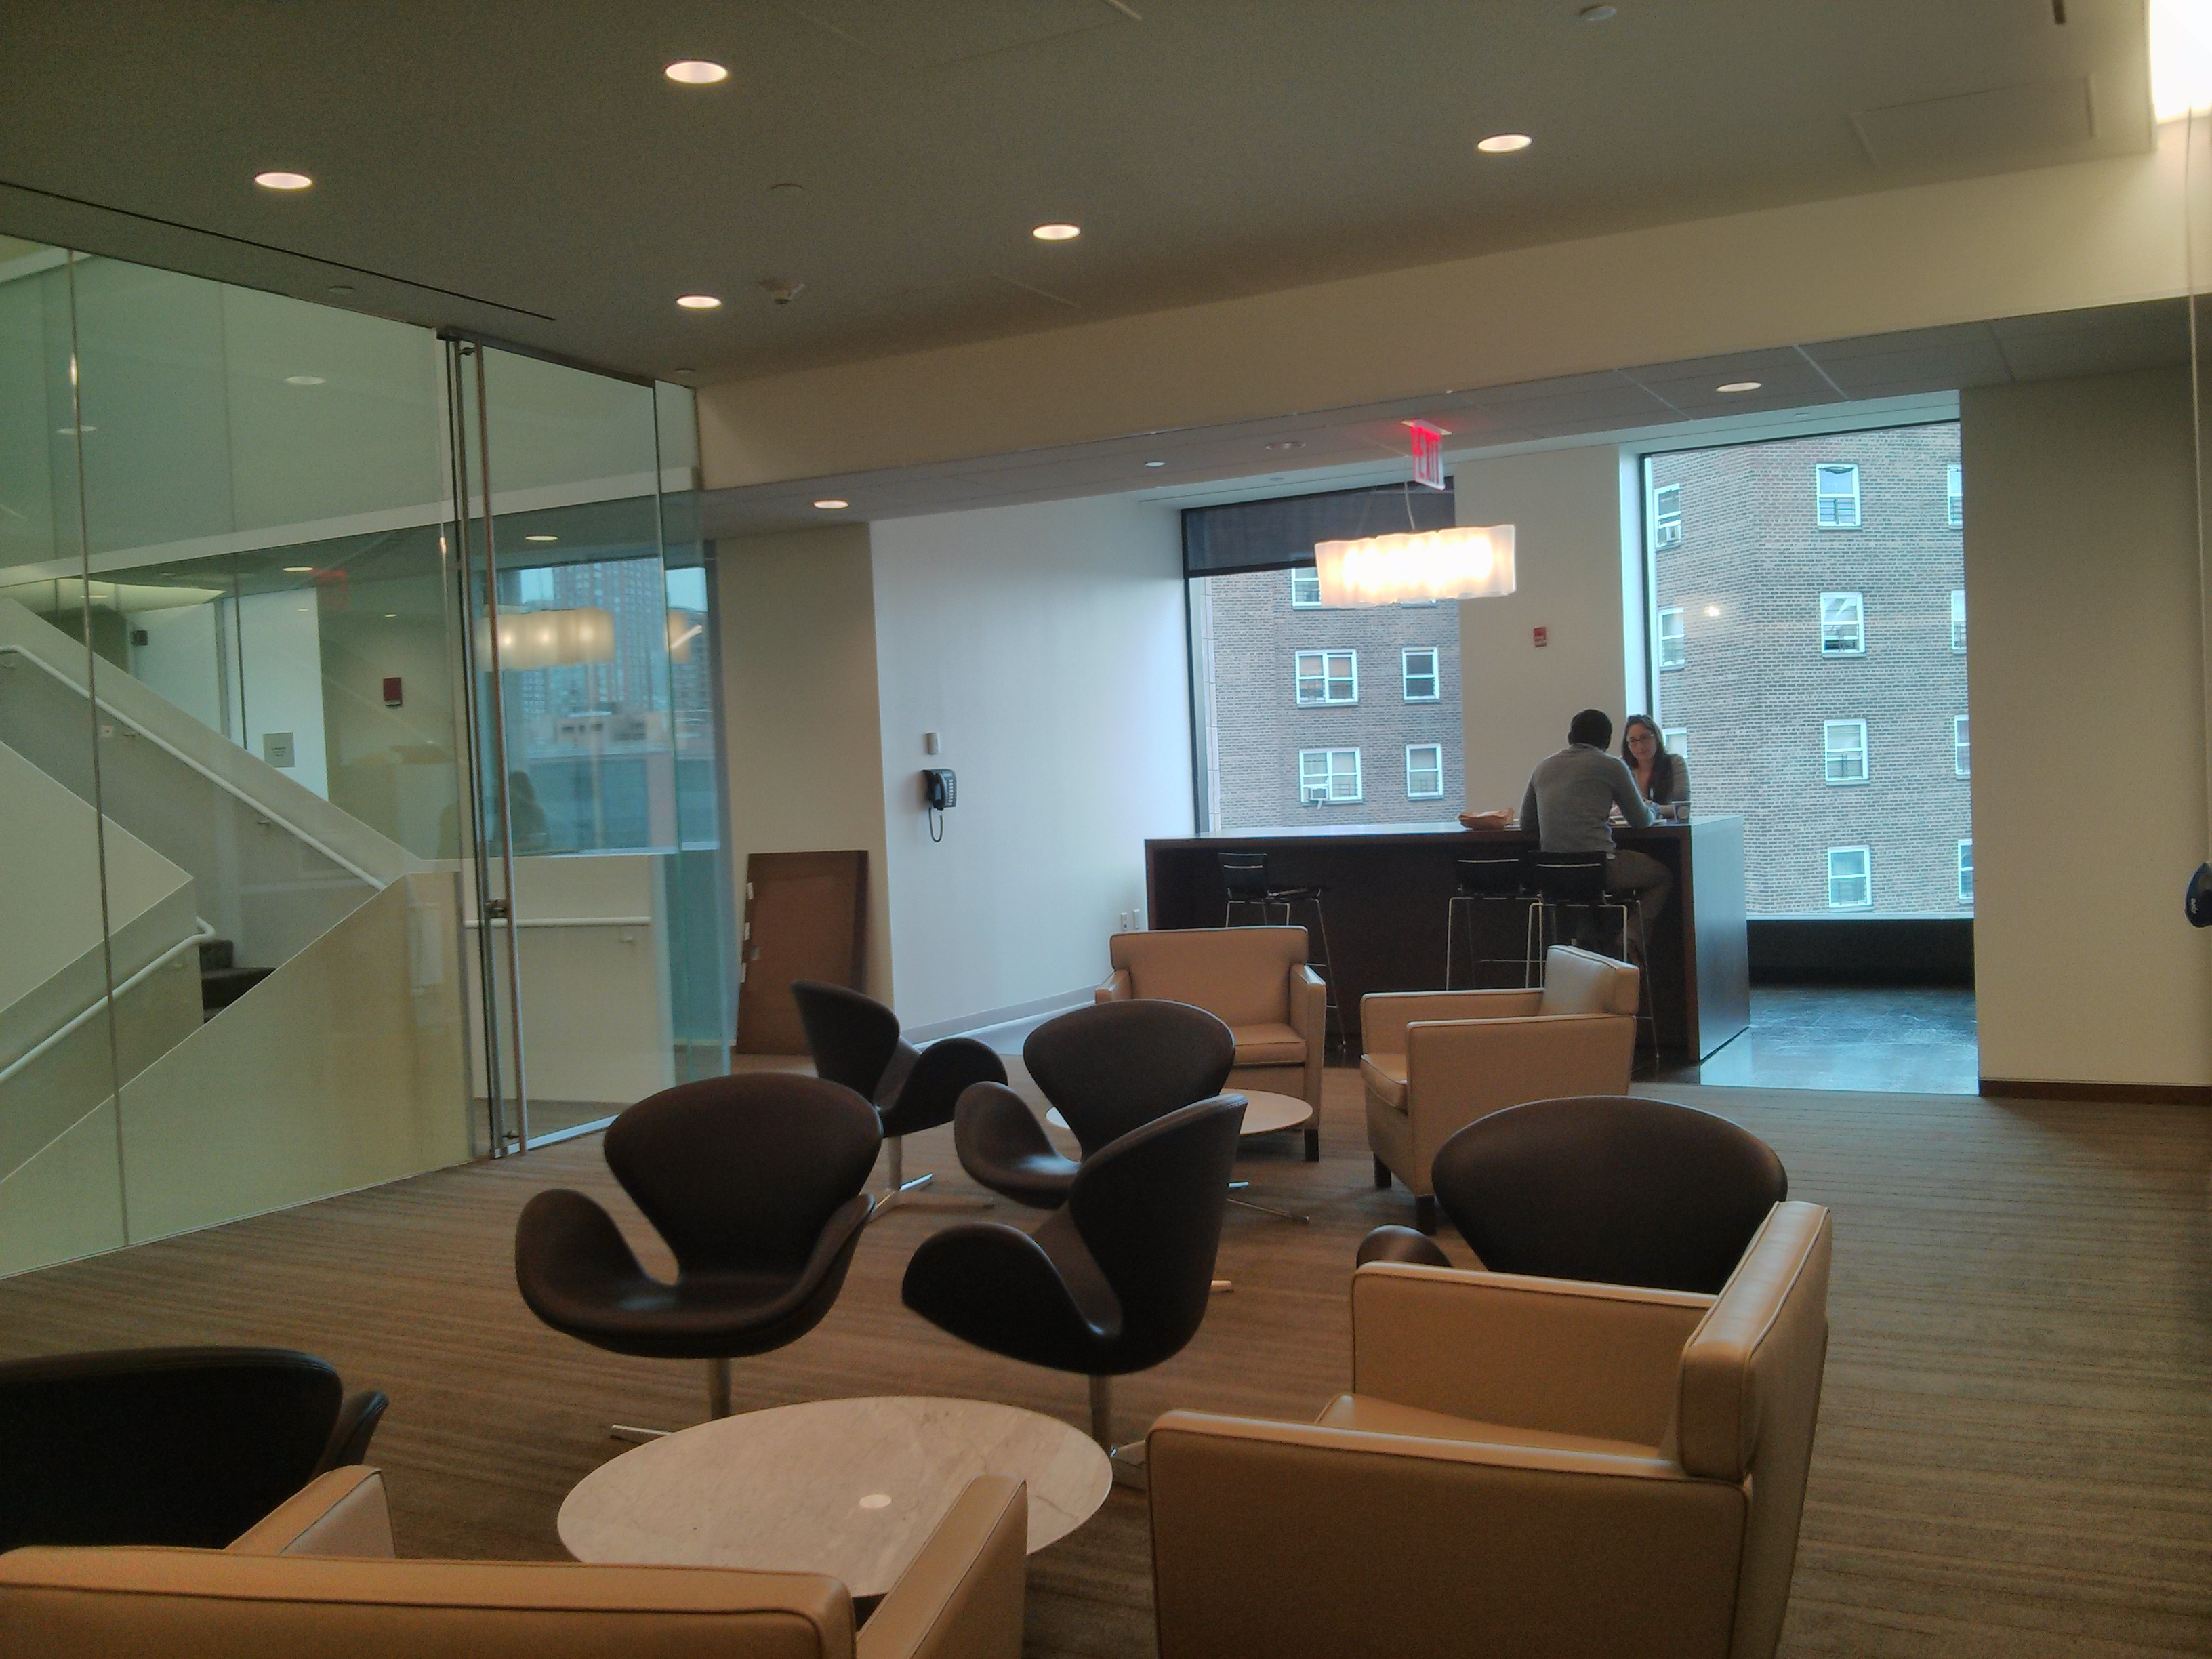 8th floor socializing area